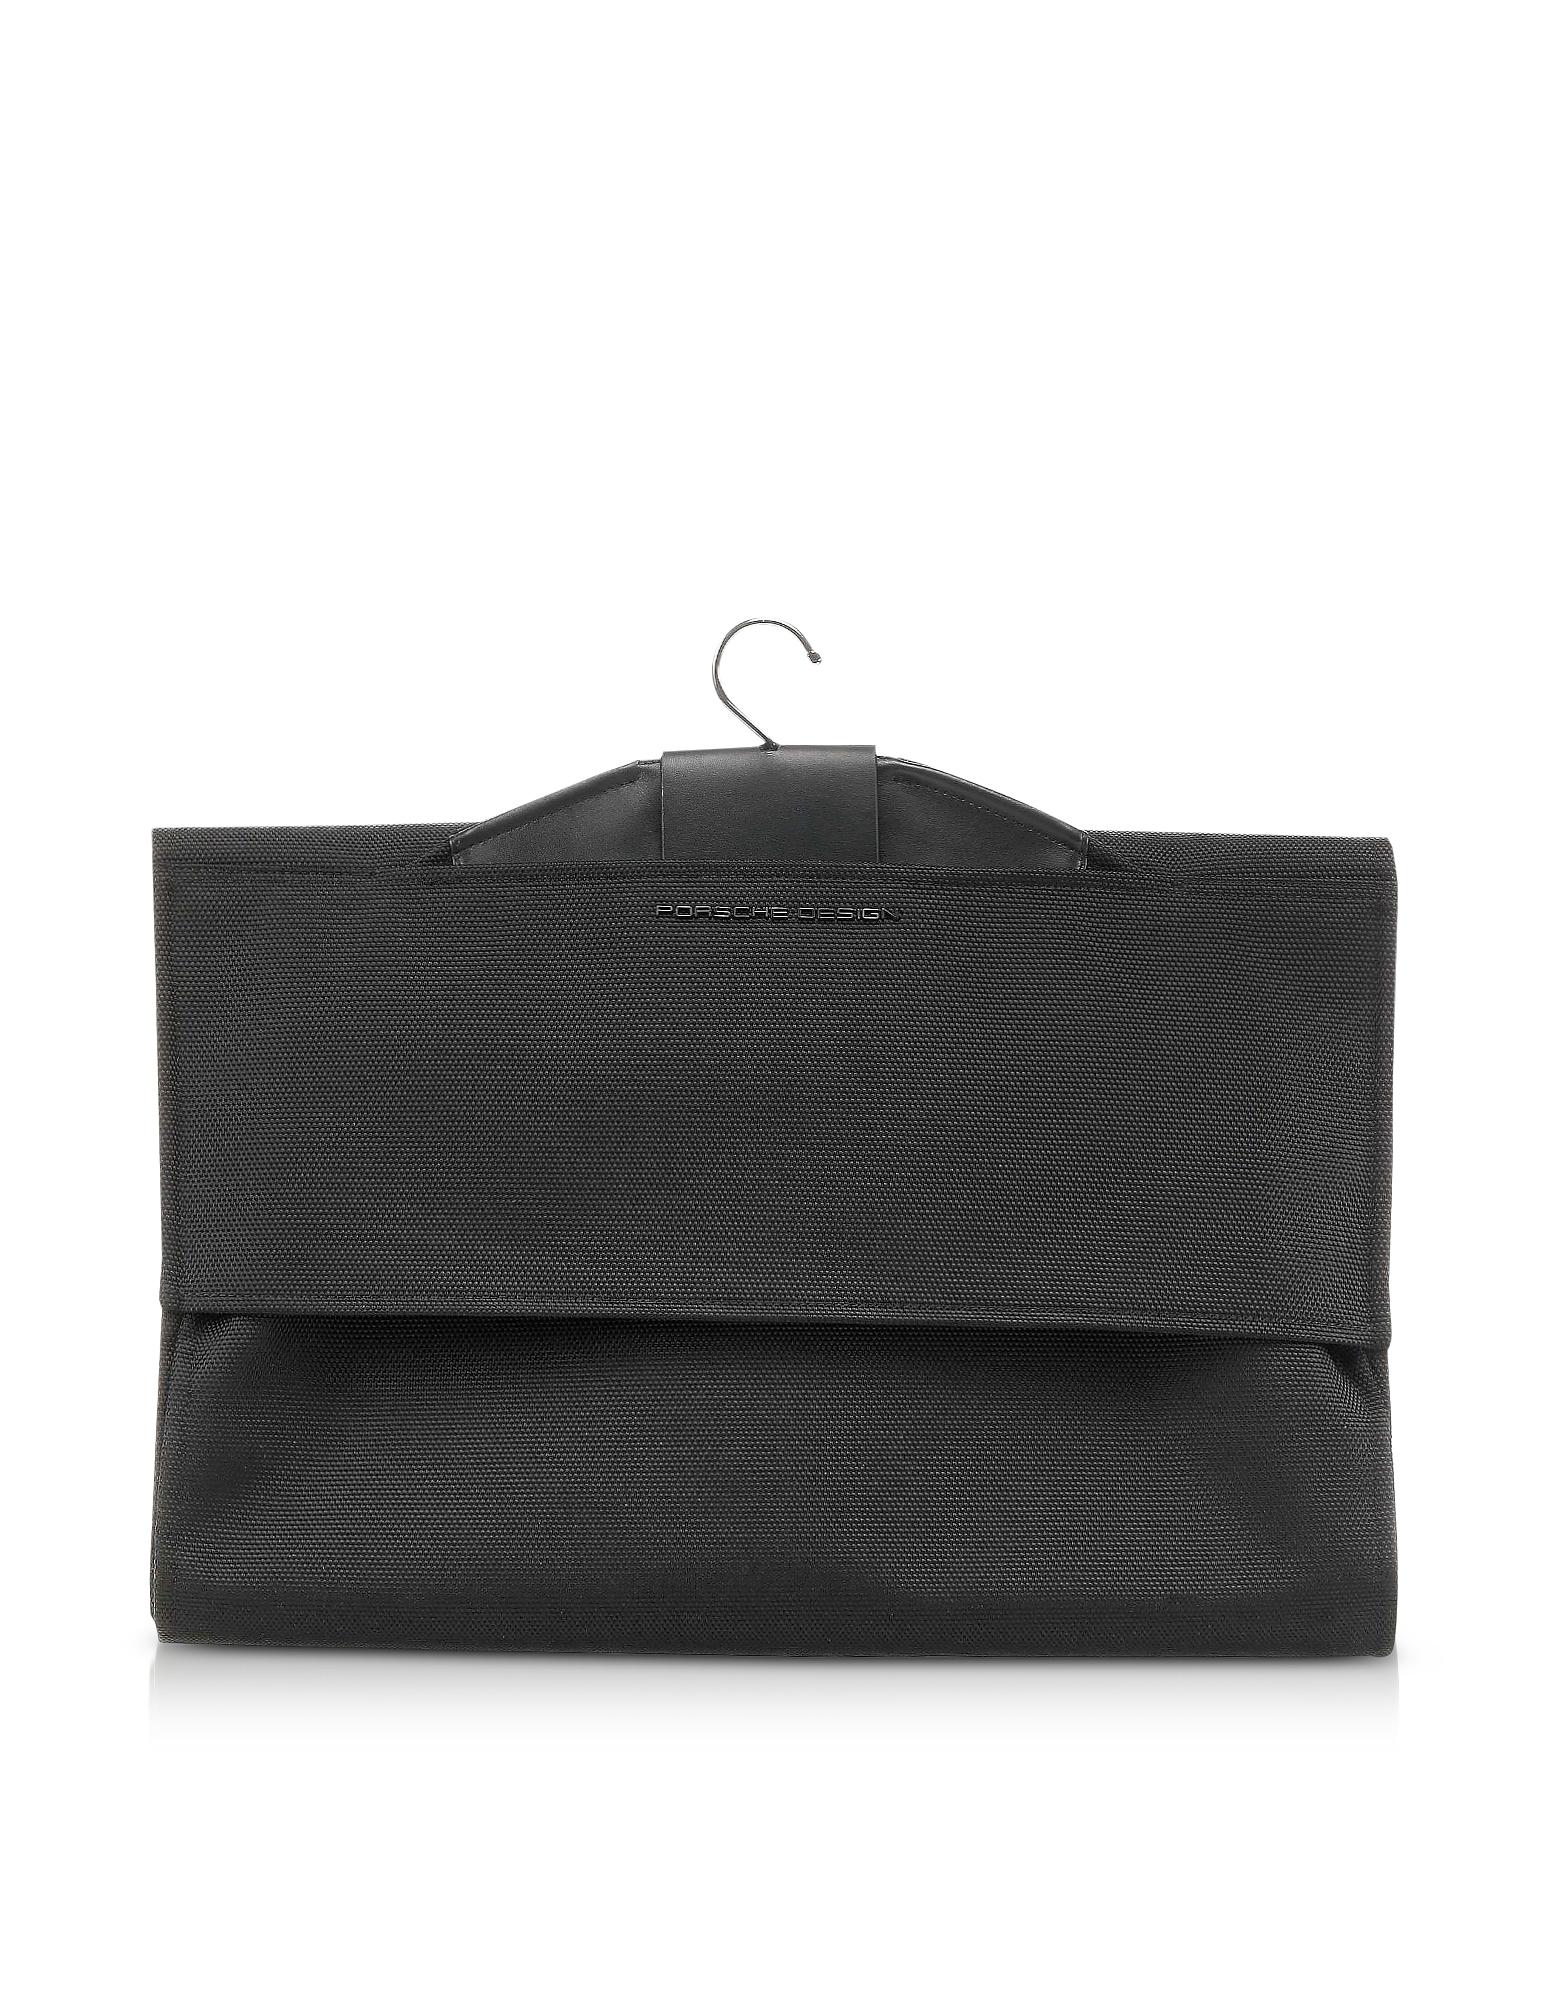 Roadster 4.0 xsvz Garment Bag, Black